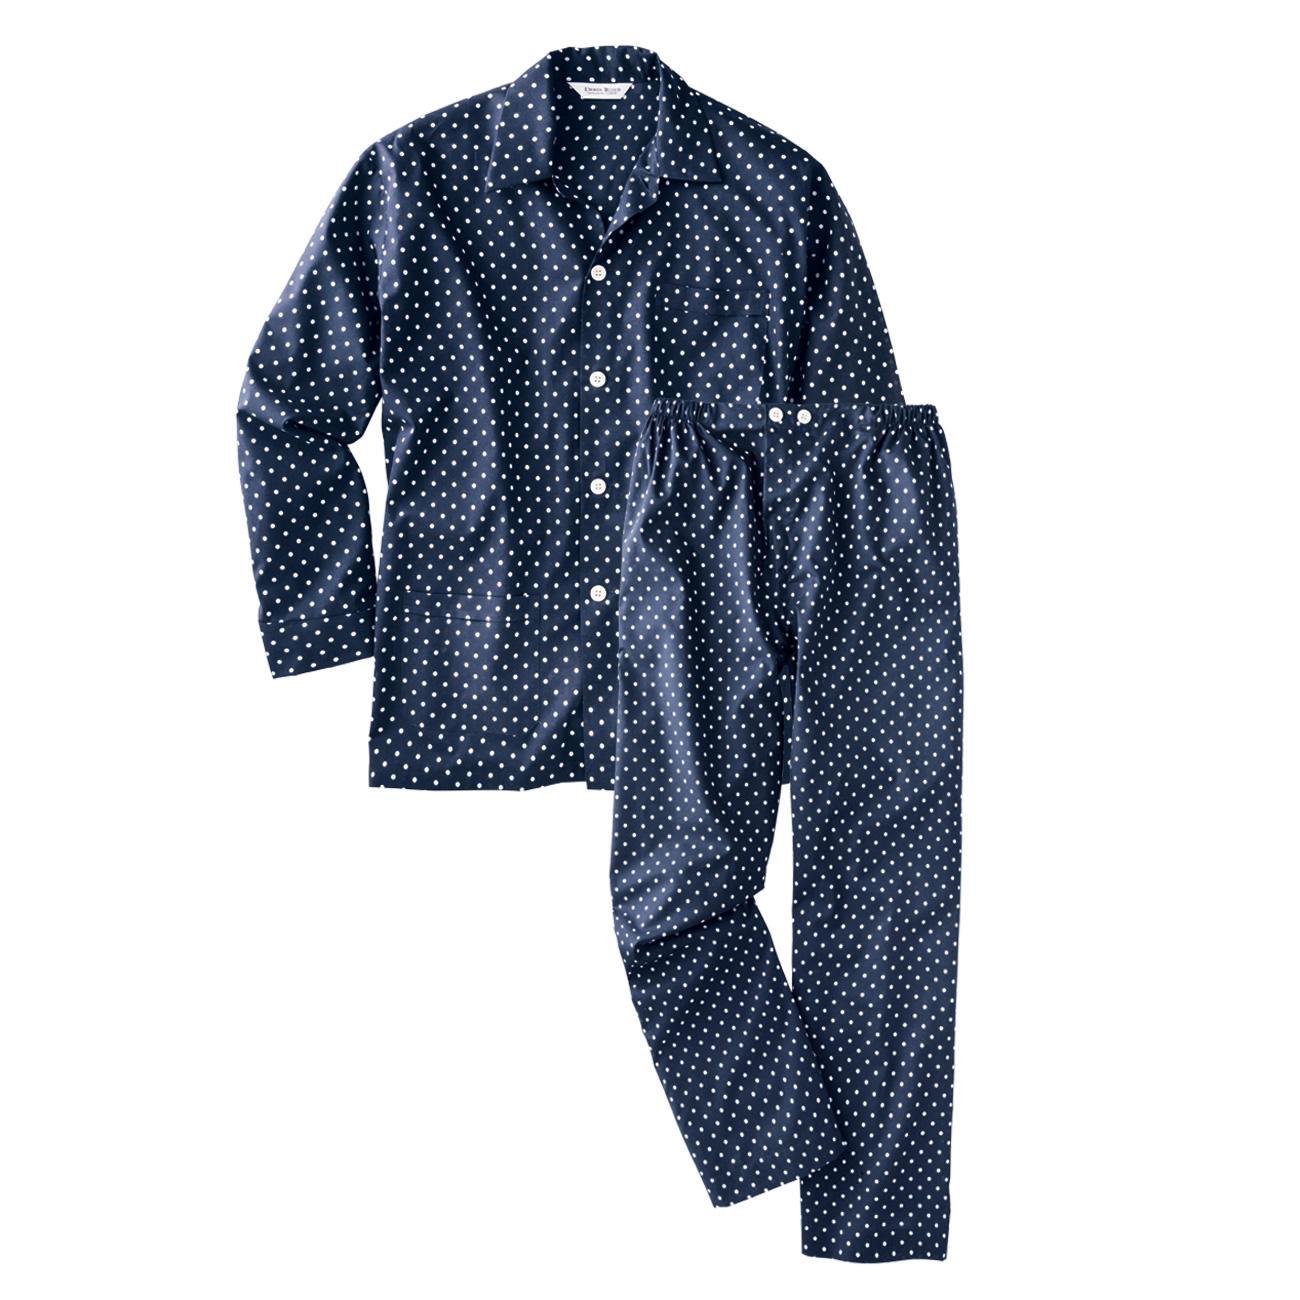 4d91cb3f1c5 Winston-pyjama | Ontdek modeklassiekers